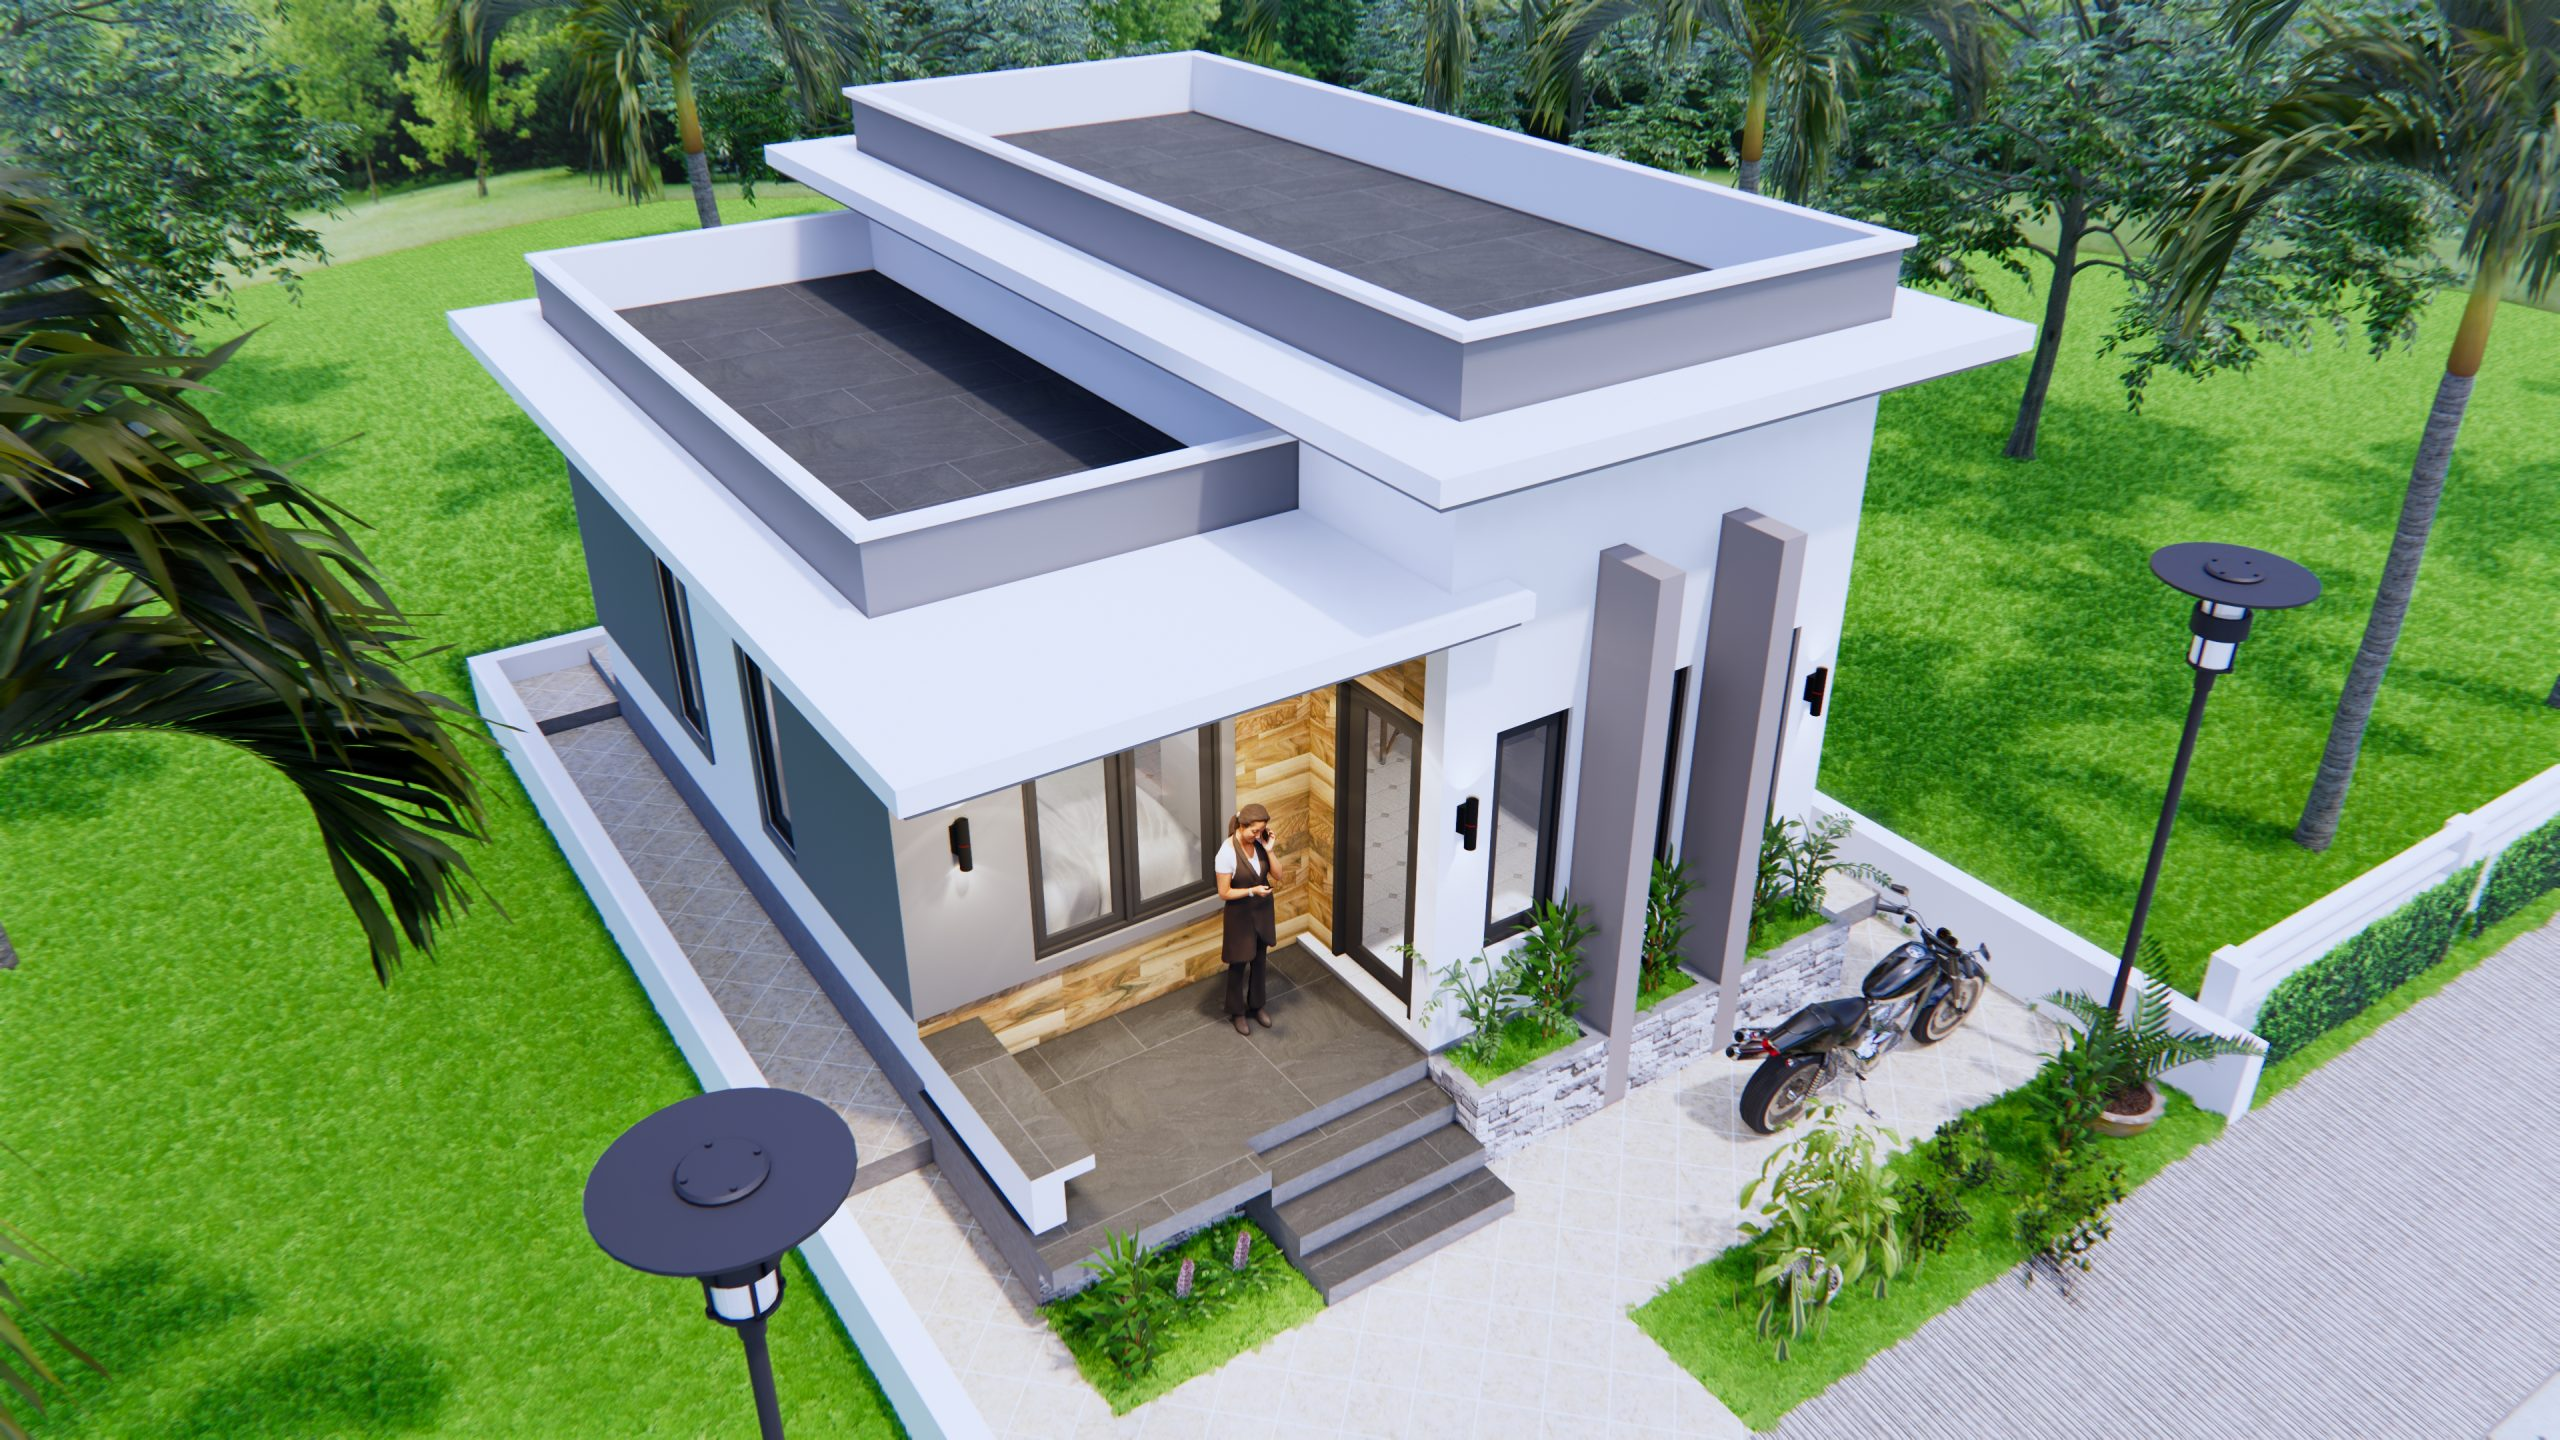 Best Small House Plans 6x8 Meter 20x27 Feet 2 Beds 3